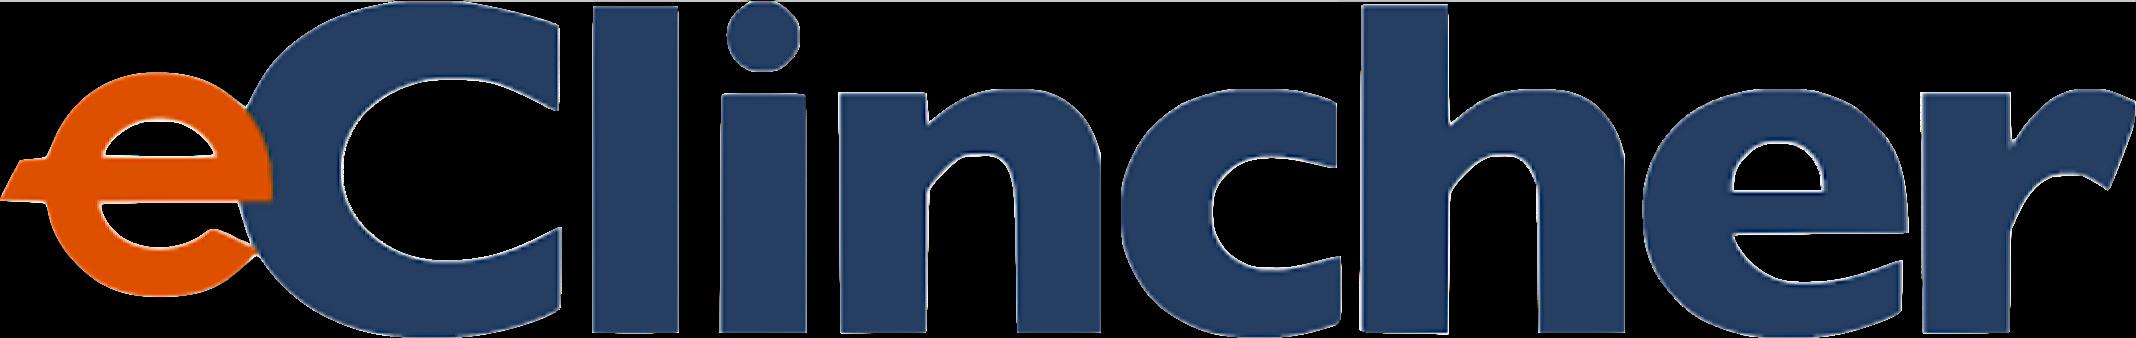 eClincher logo